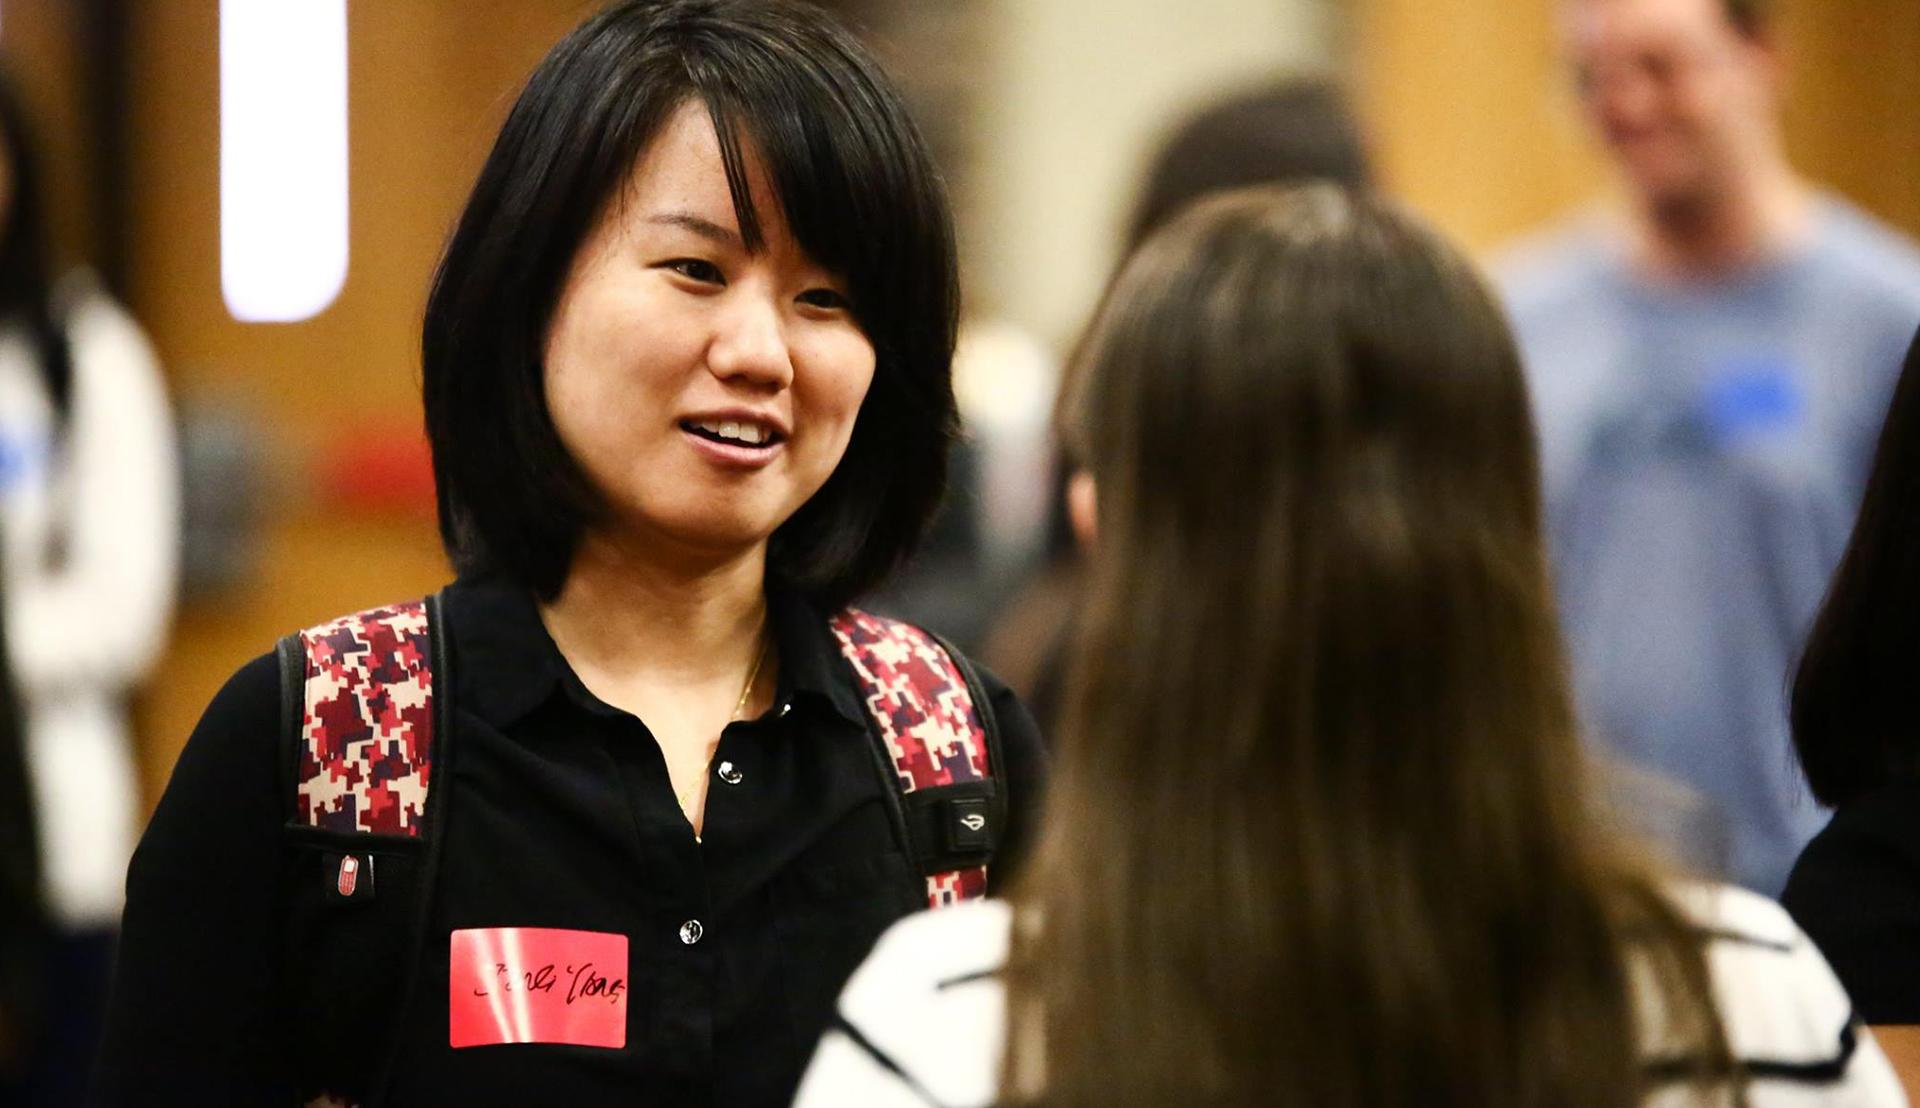 Ifp Conversation Partners Program Match Party Rutgers